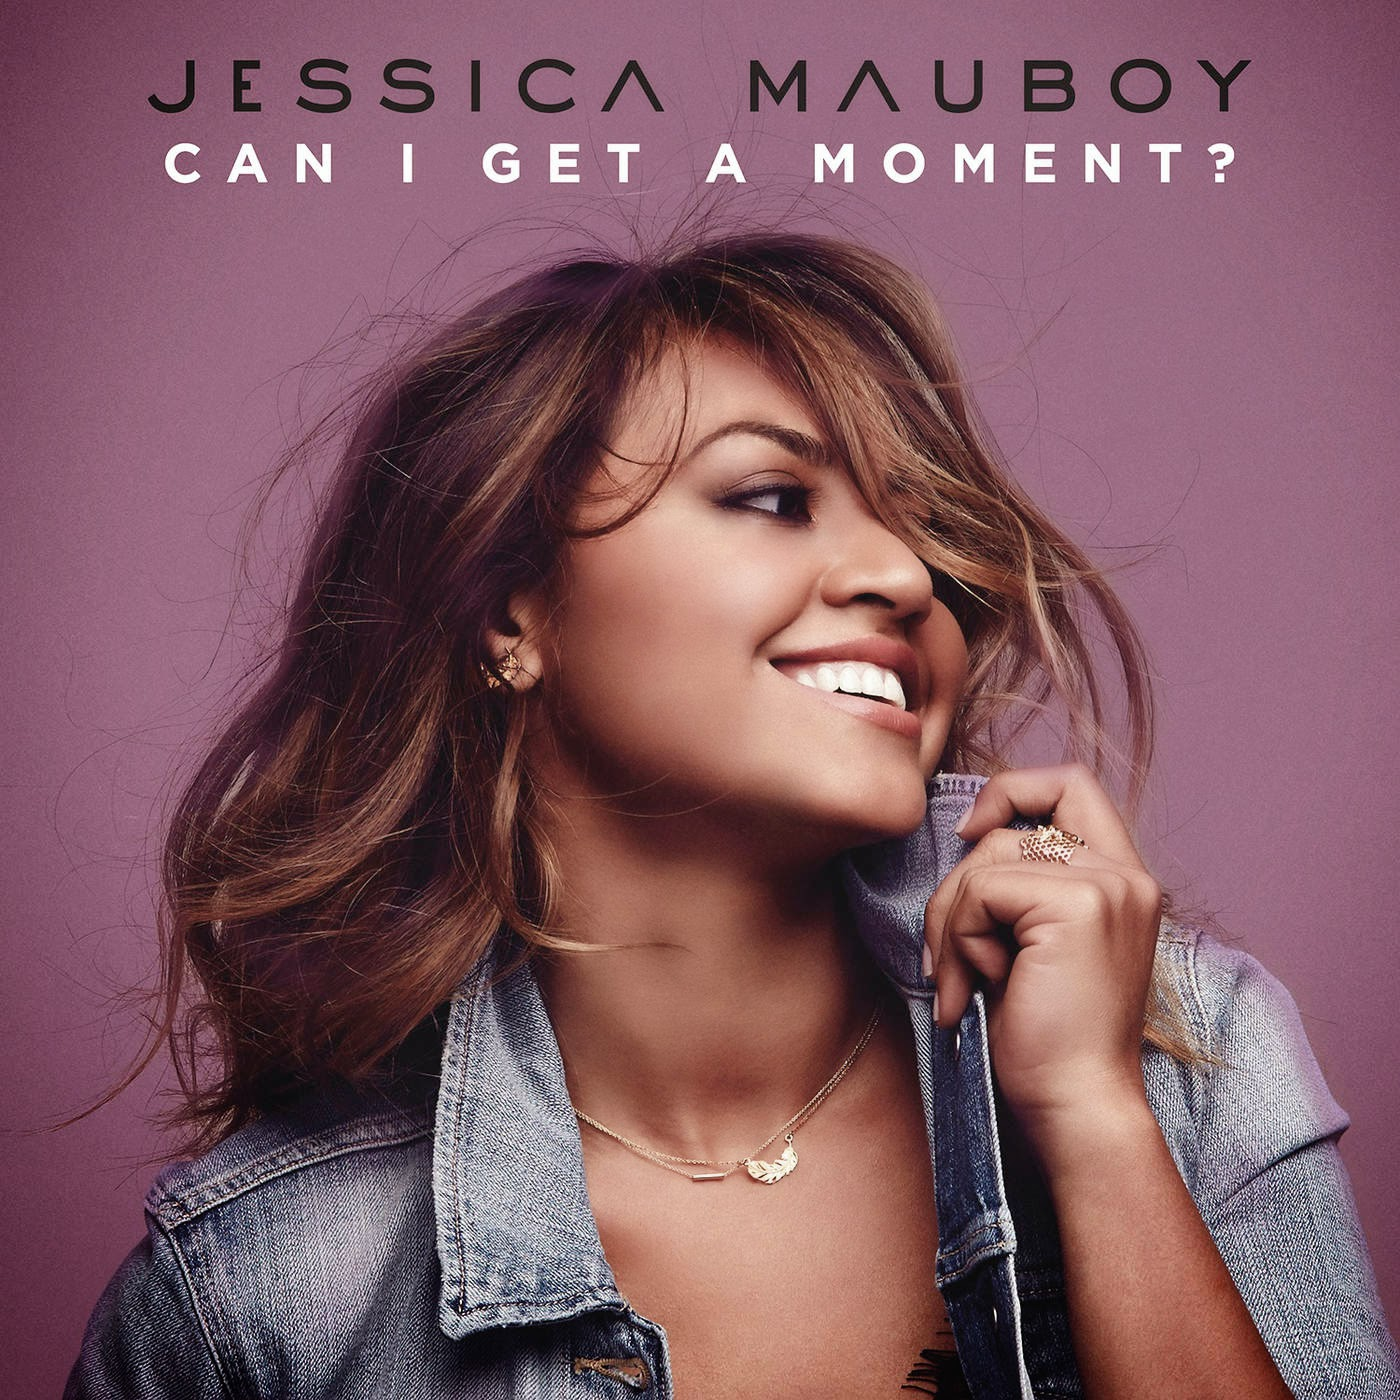 Jessica Mauboy - Can I Get A Moment? - Single Cover